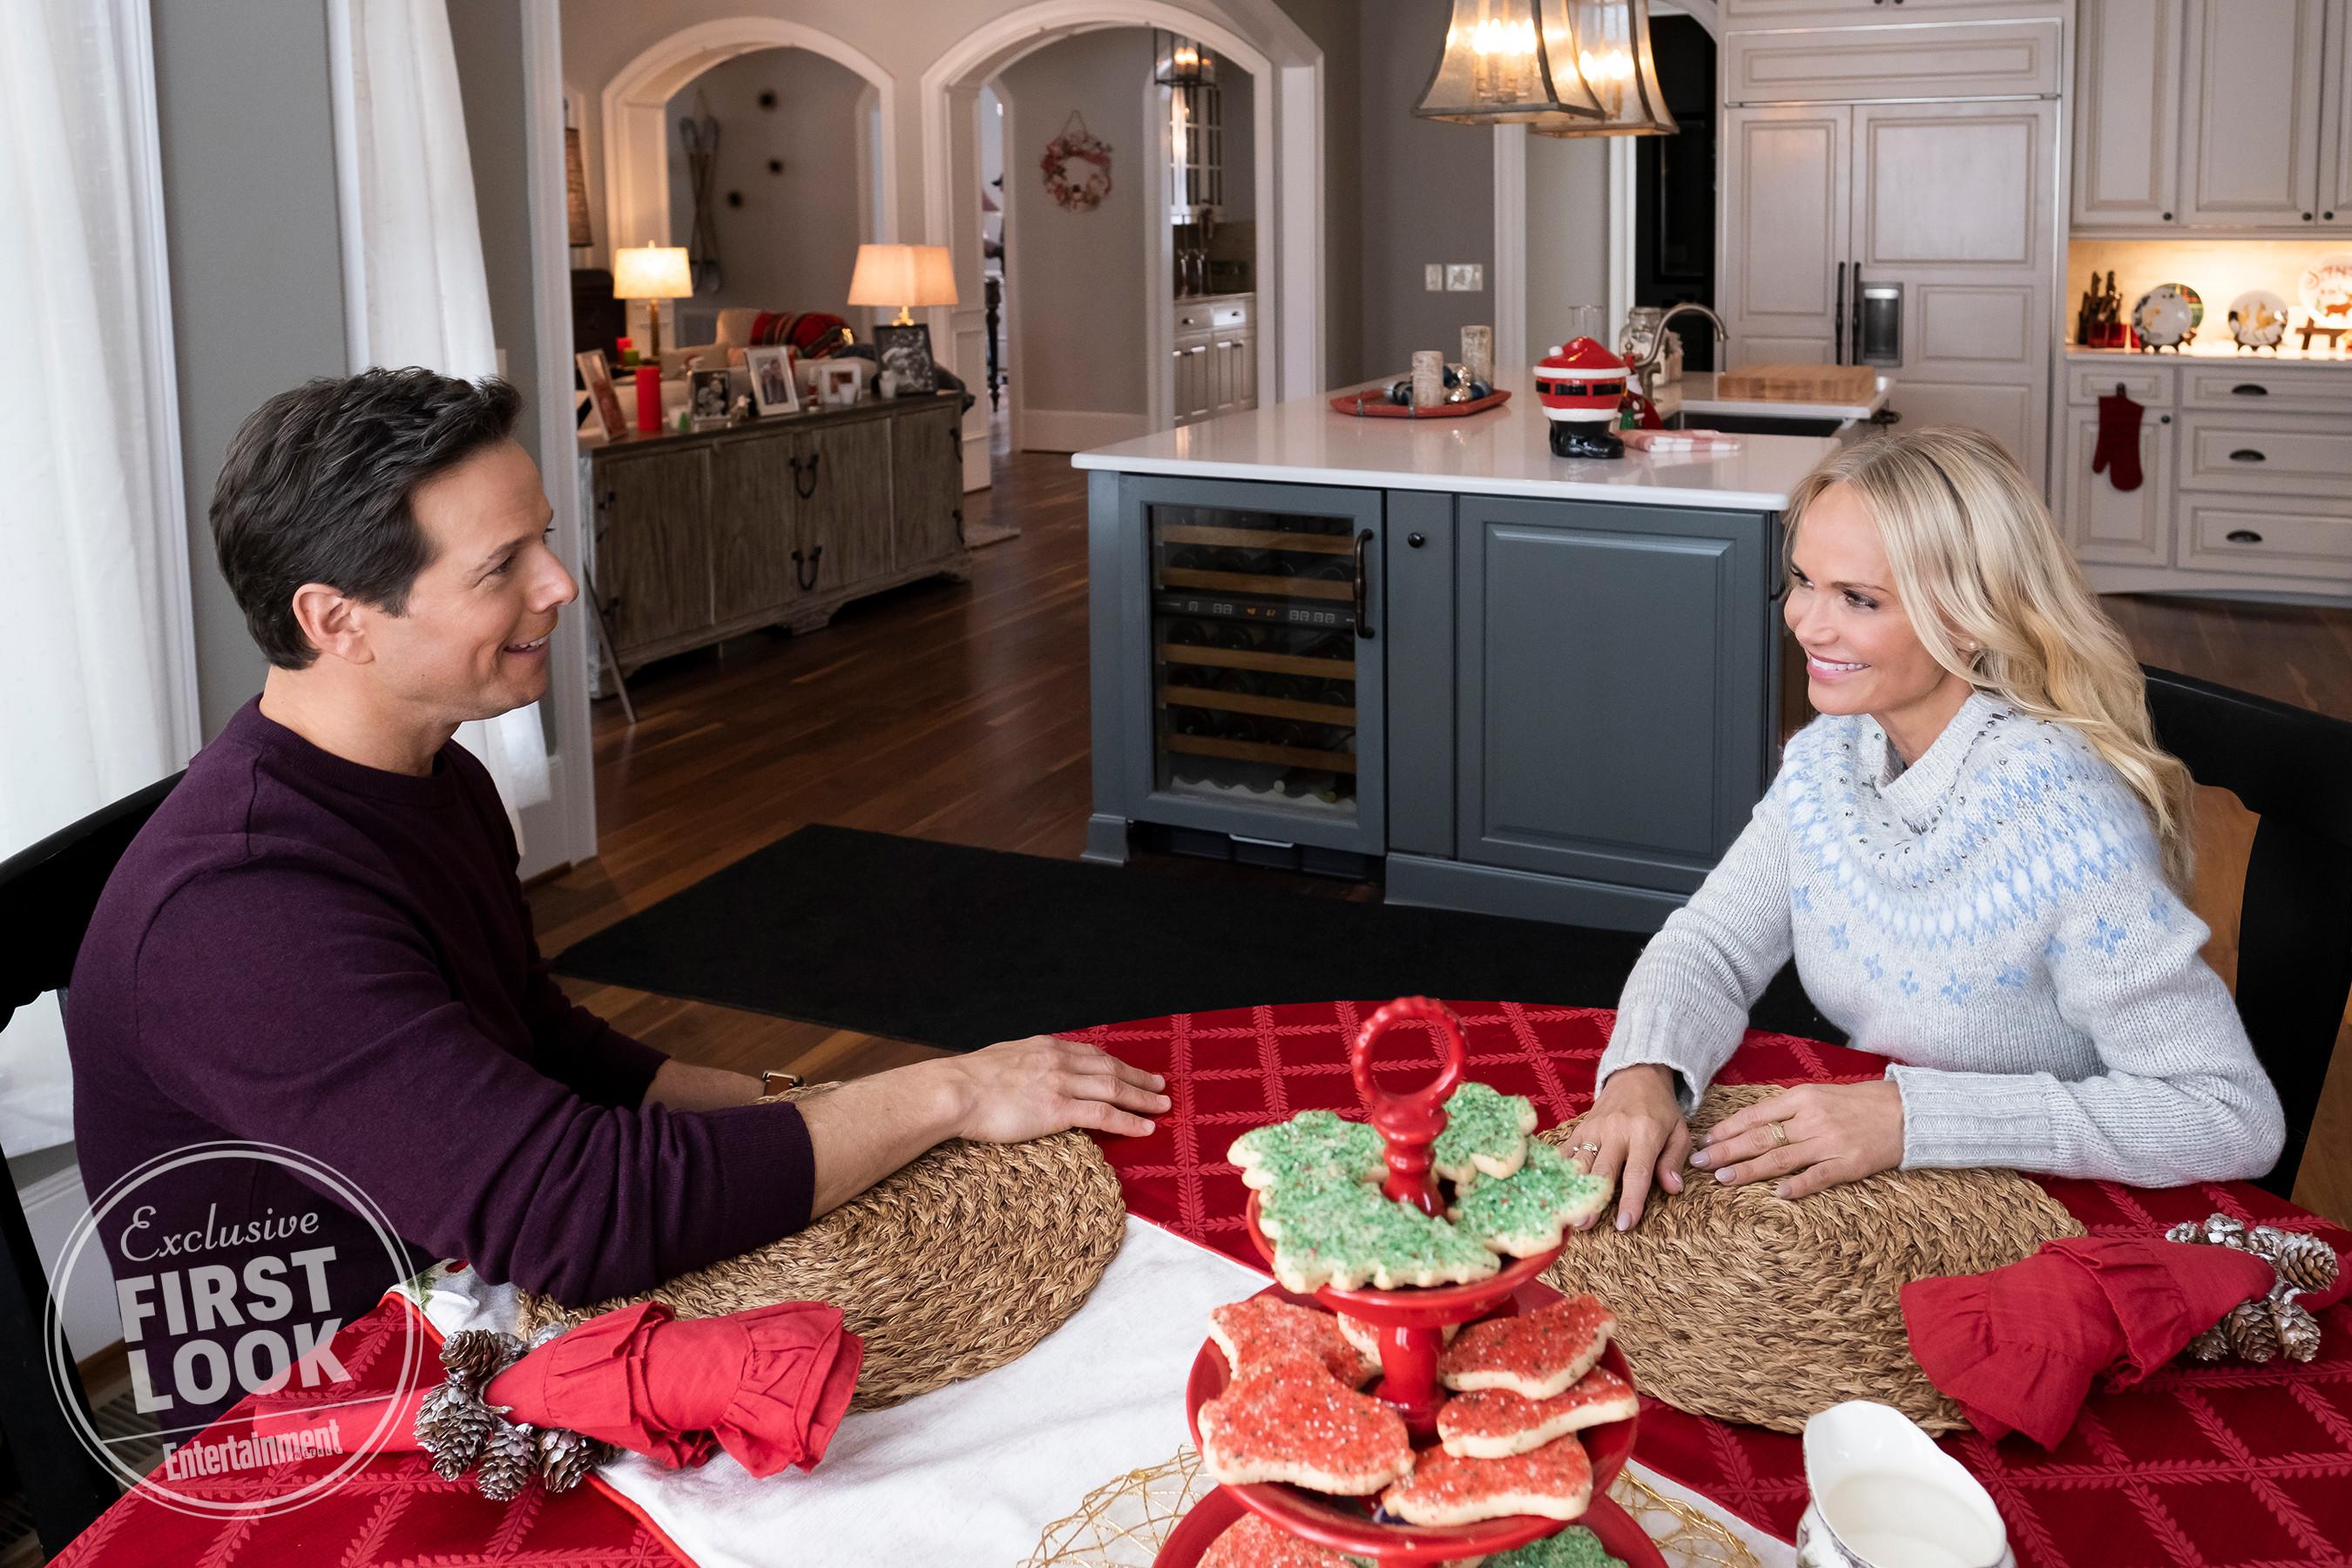 Christmas Cookies 2019 Movie  Hallmark orders 40 new Christmas movies in 2019